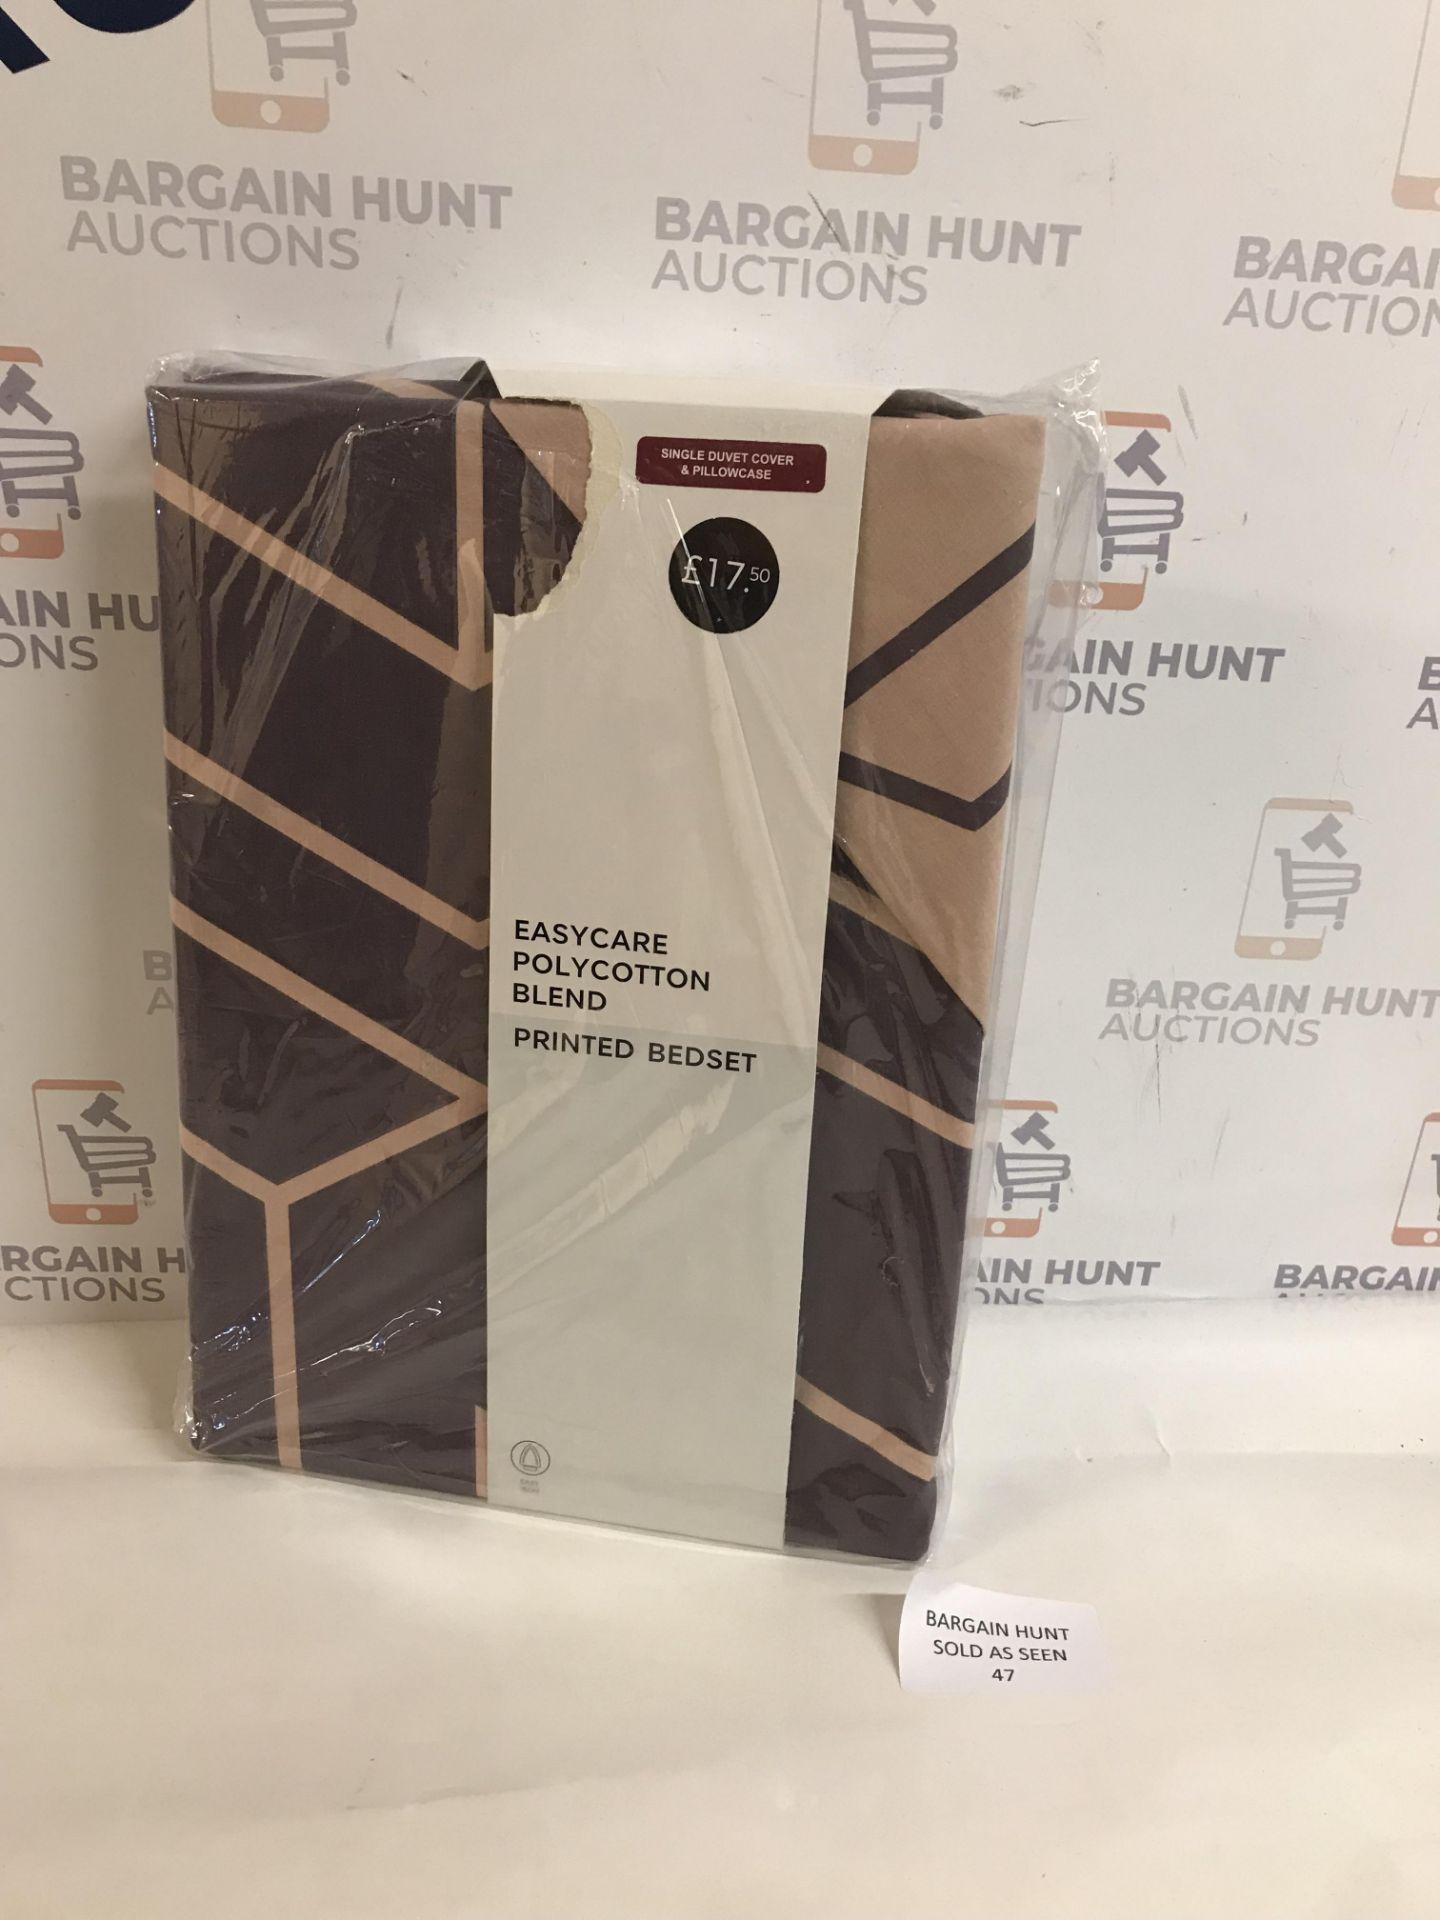 Lot 47 - Easycare Polycotton Blend Printed Bedding Set, Single